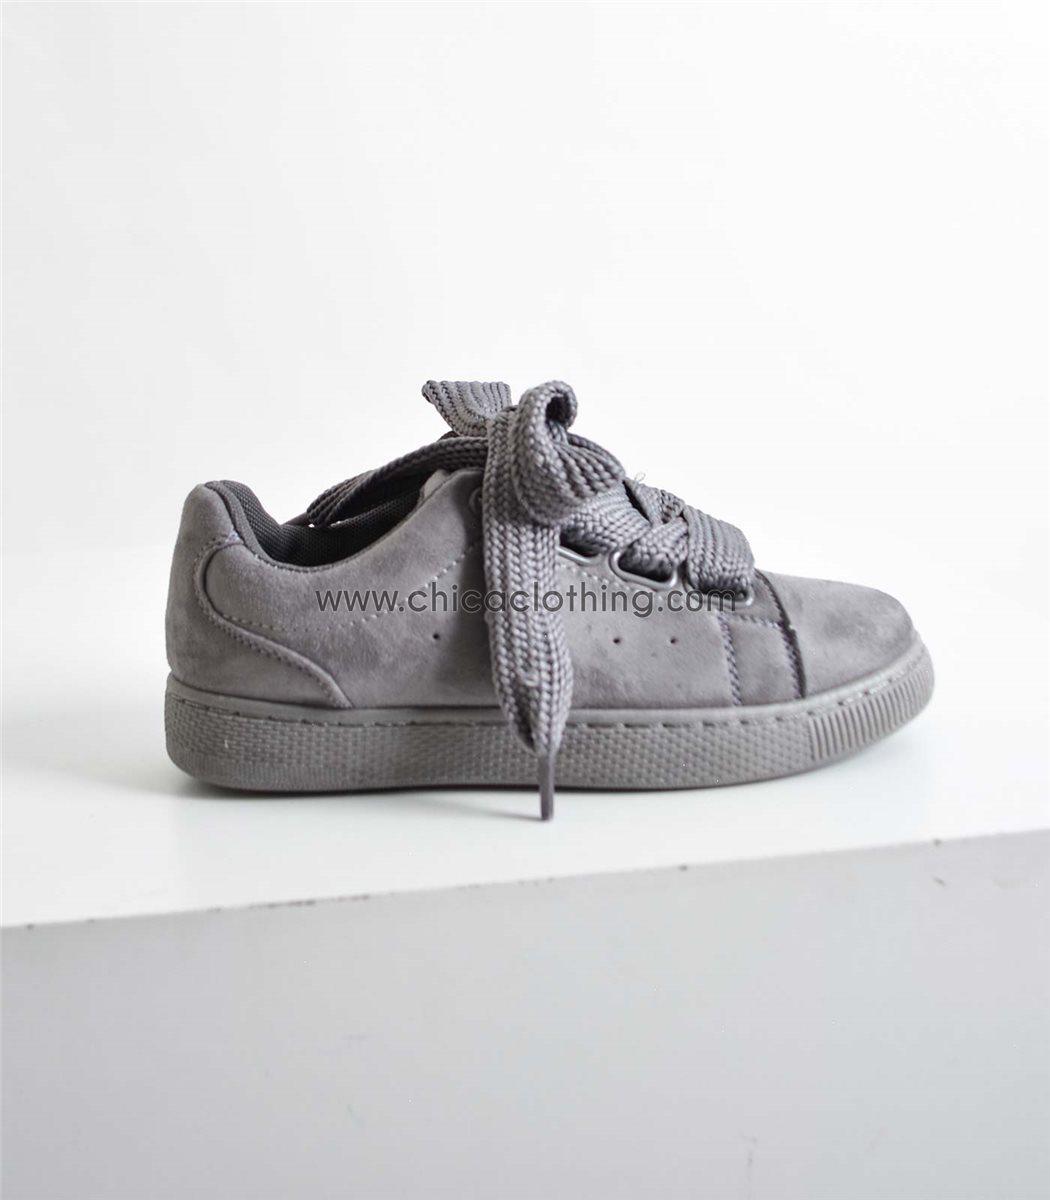 ee3a726d71e Γυναικεία γκρι sneaker σουέτ με δύο διαφορετικά κορδόνια